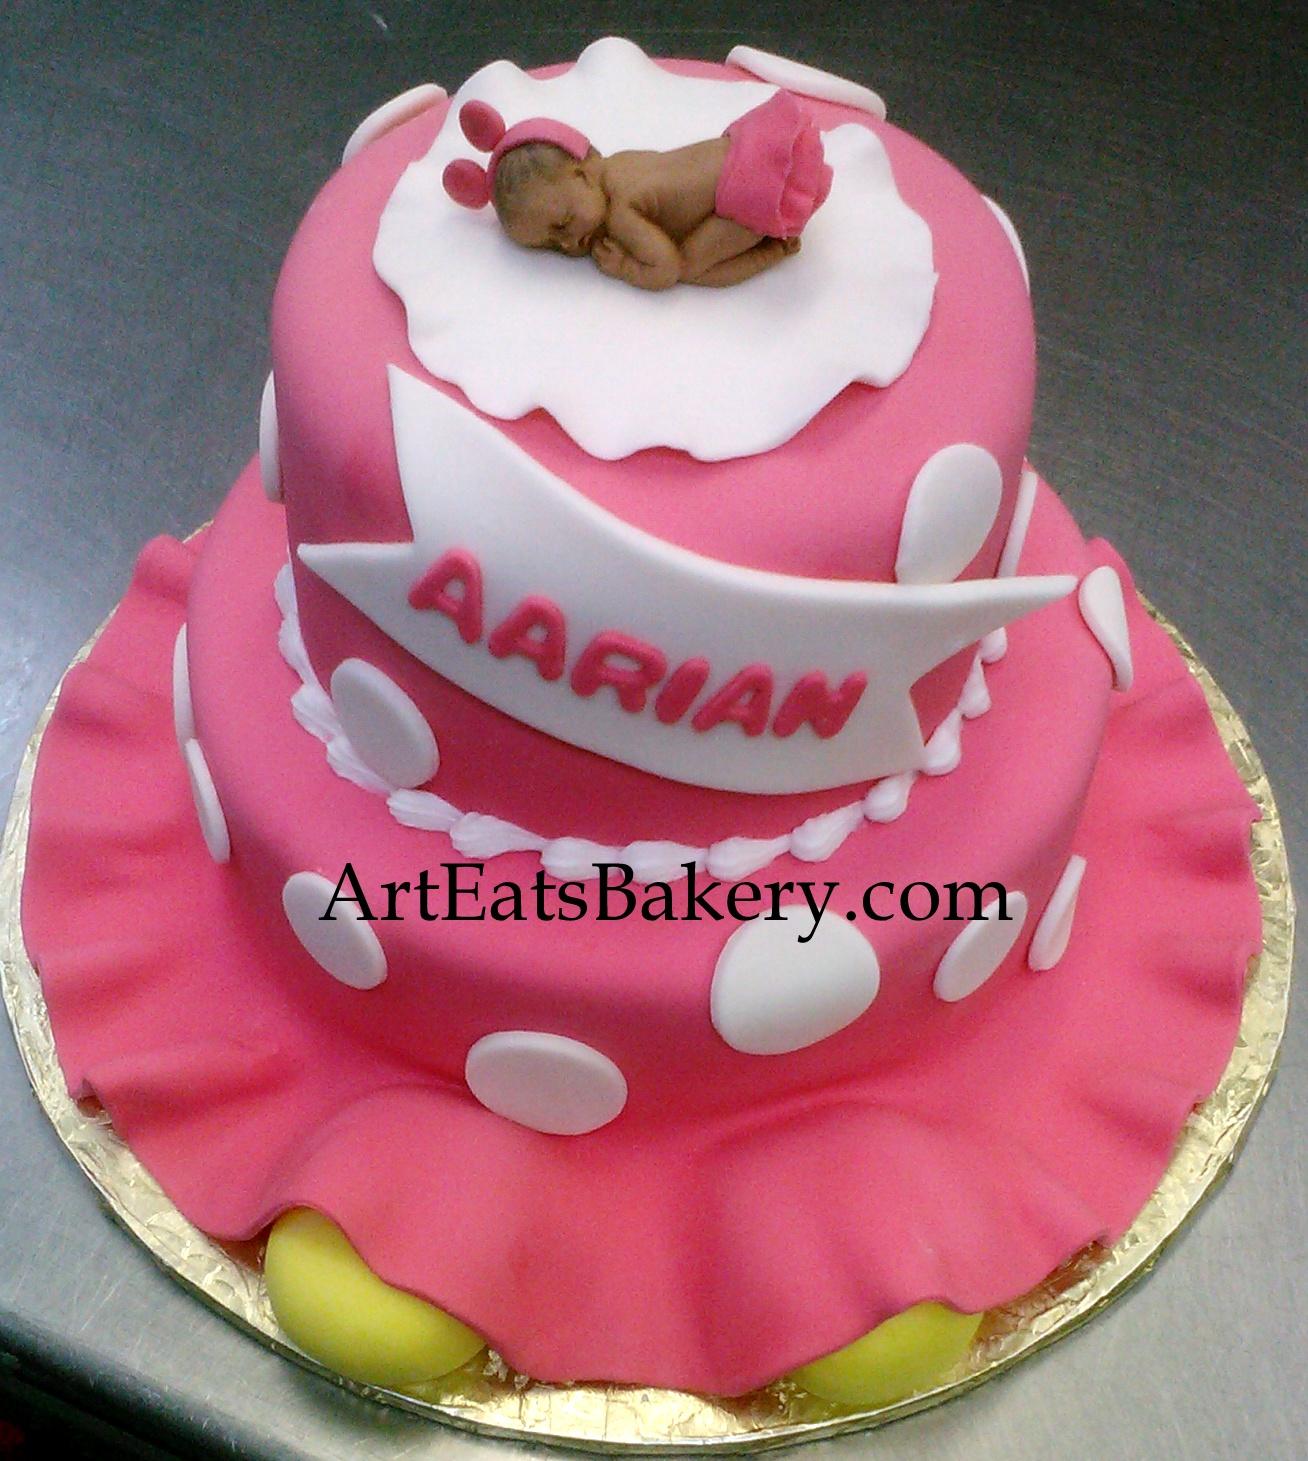 3D Pink and white polka dot custom modern girl's baby shower cake design with sleeping baby Miniie Mouse topper.jpg